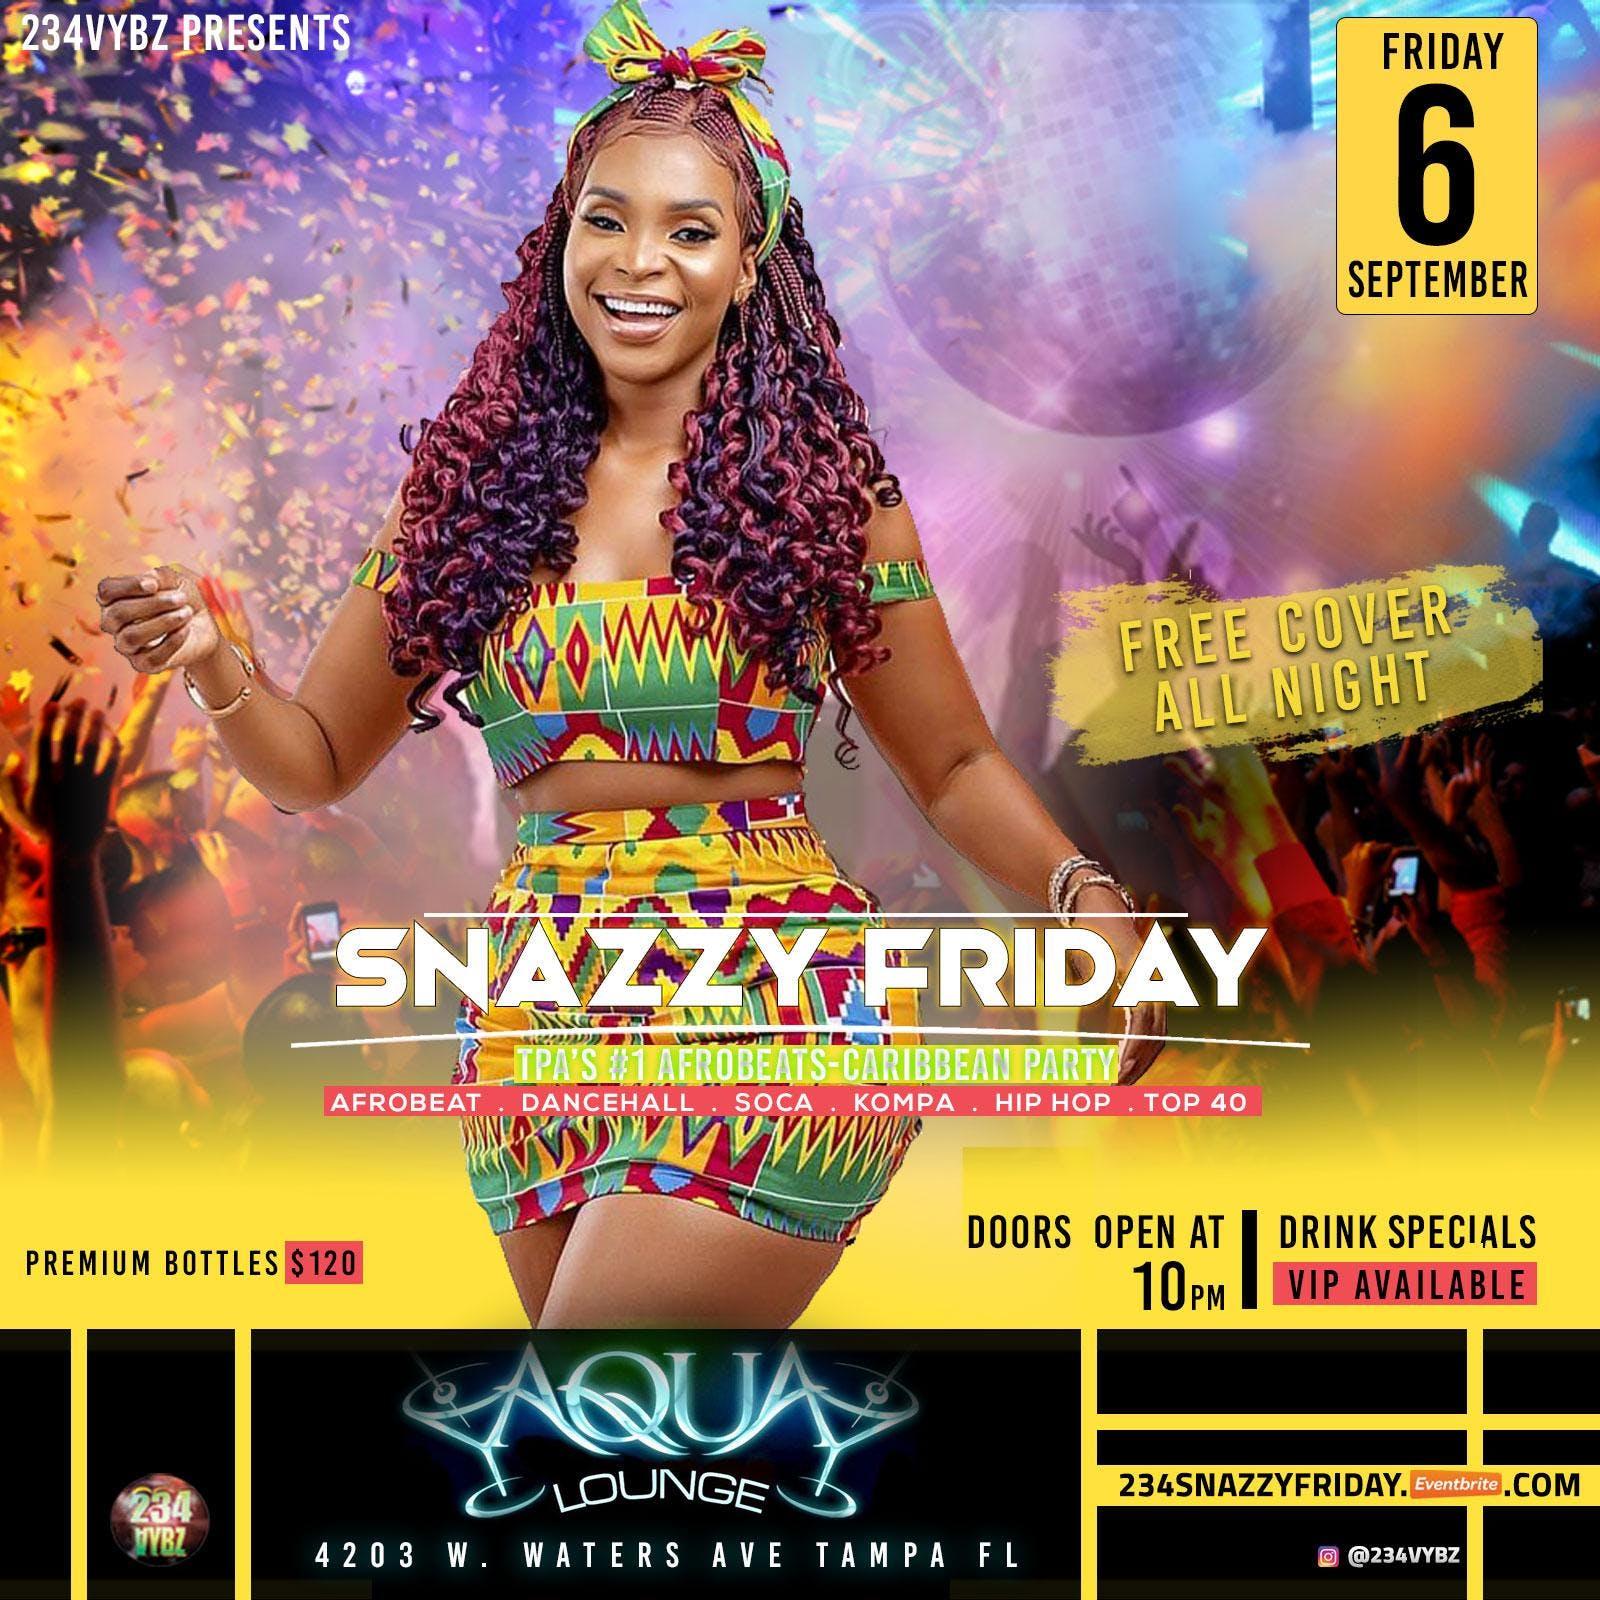 234Vybz SNAZZY FRIDAY | TPA's #1 Afrobeats-Caribbean Party